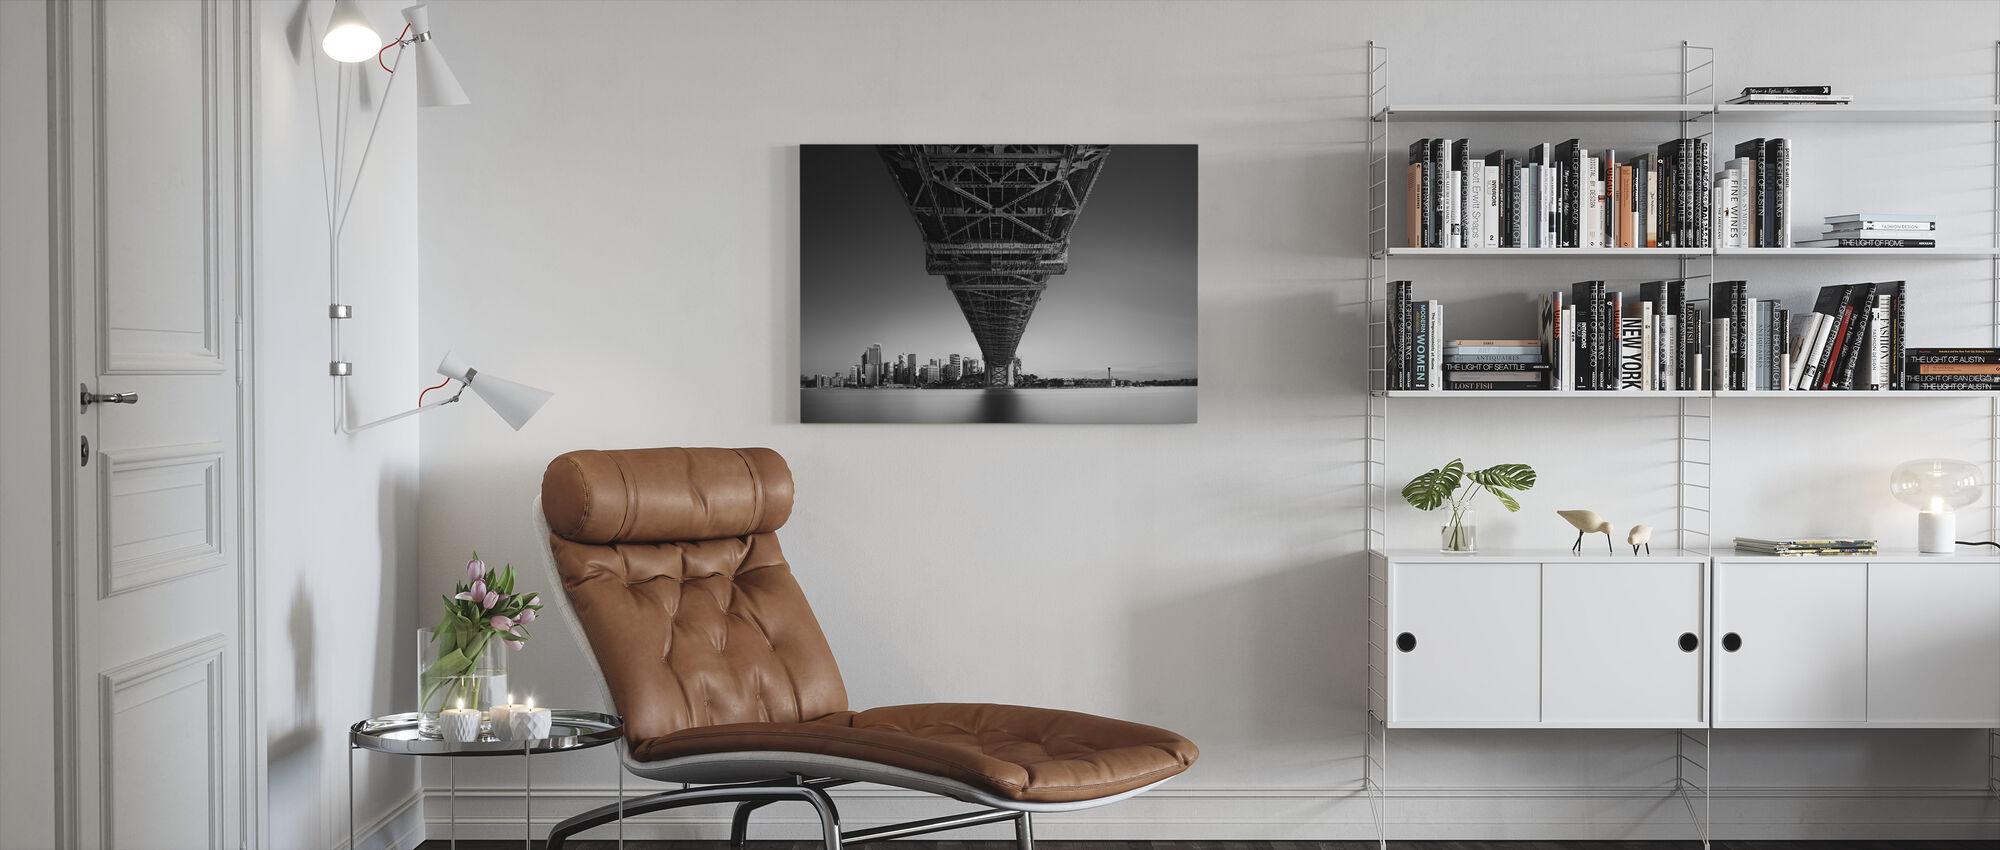 Back to Human Life - Canvas print - Living Room